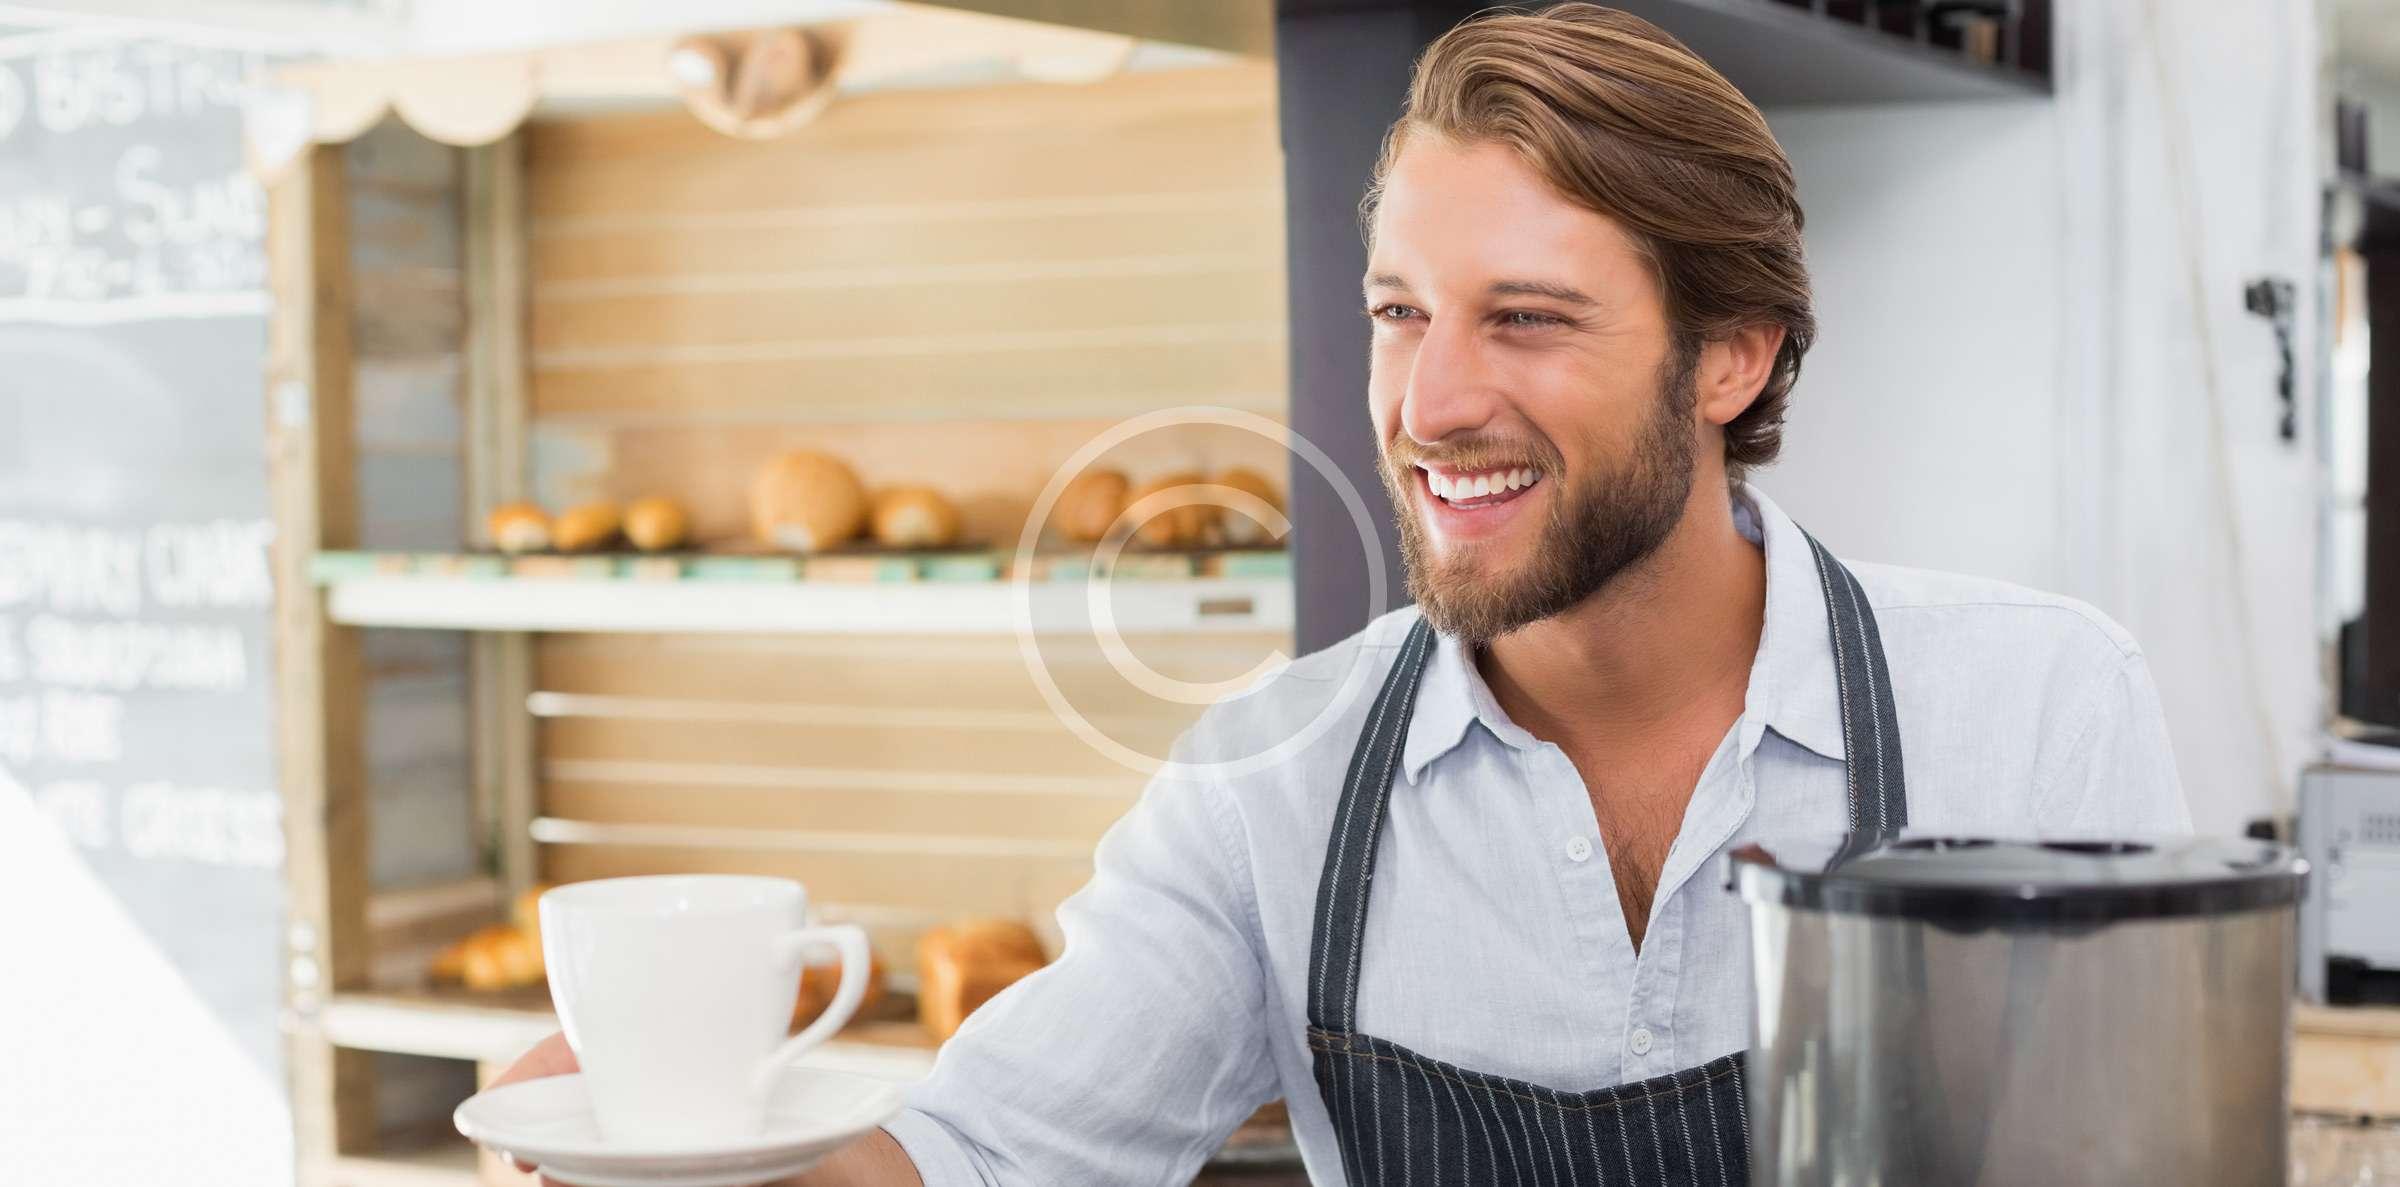 3 Surprising Health Benefits of Coffee